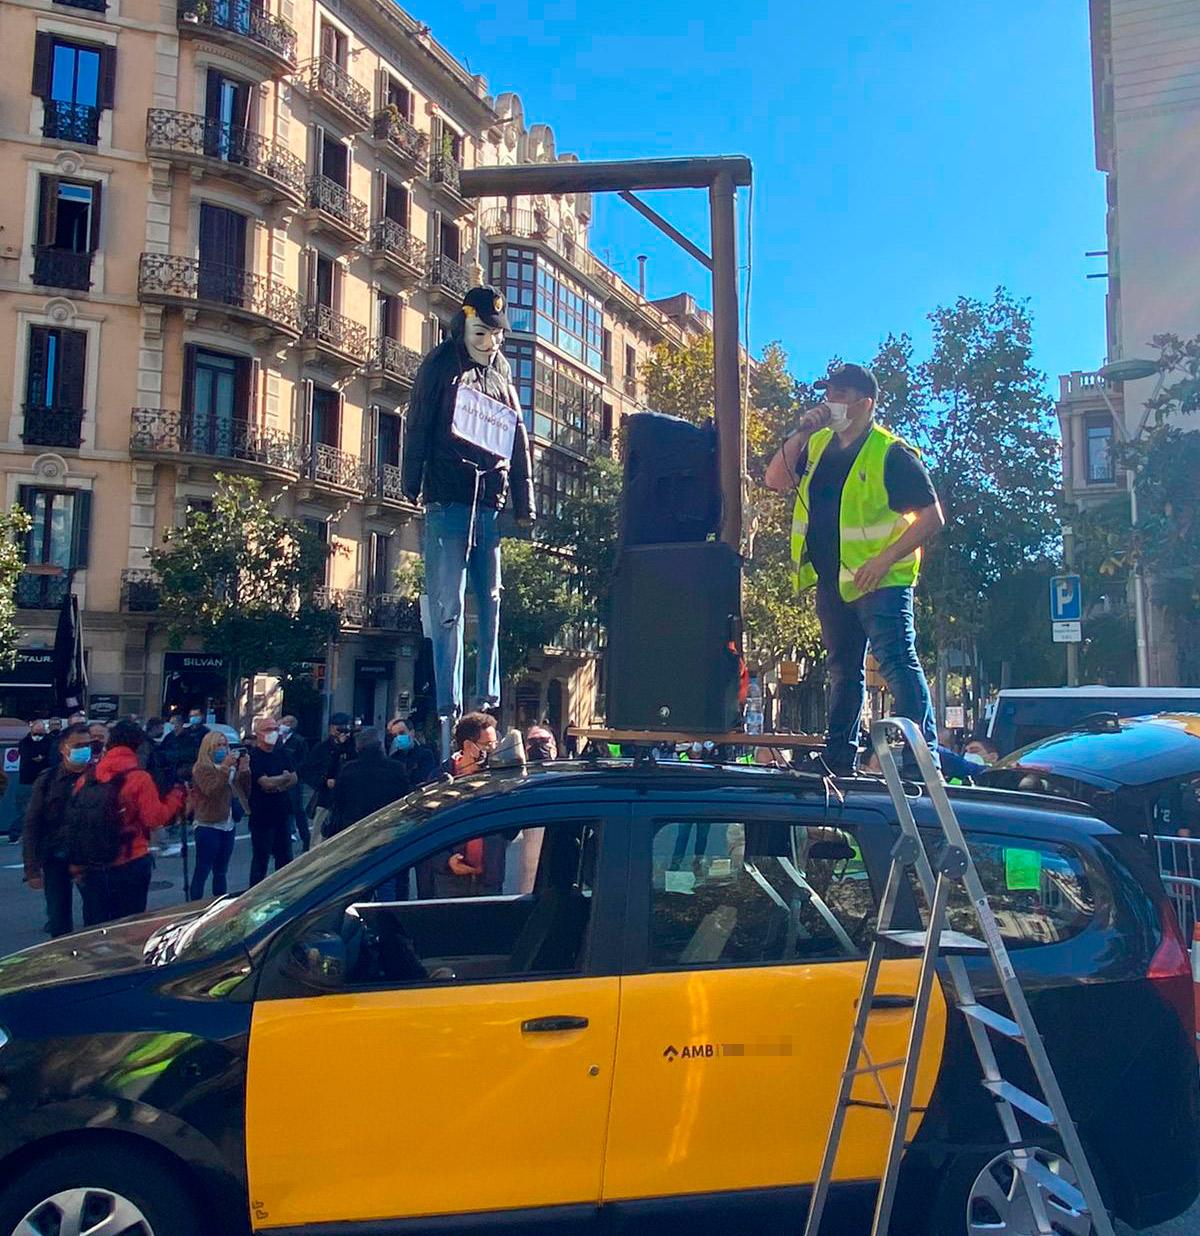 Élite taxi continúa las protestas en Barcelona